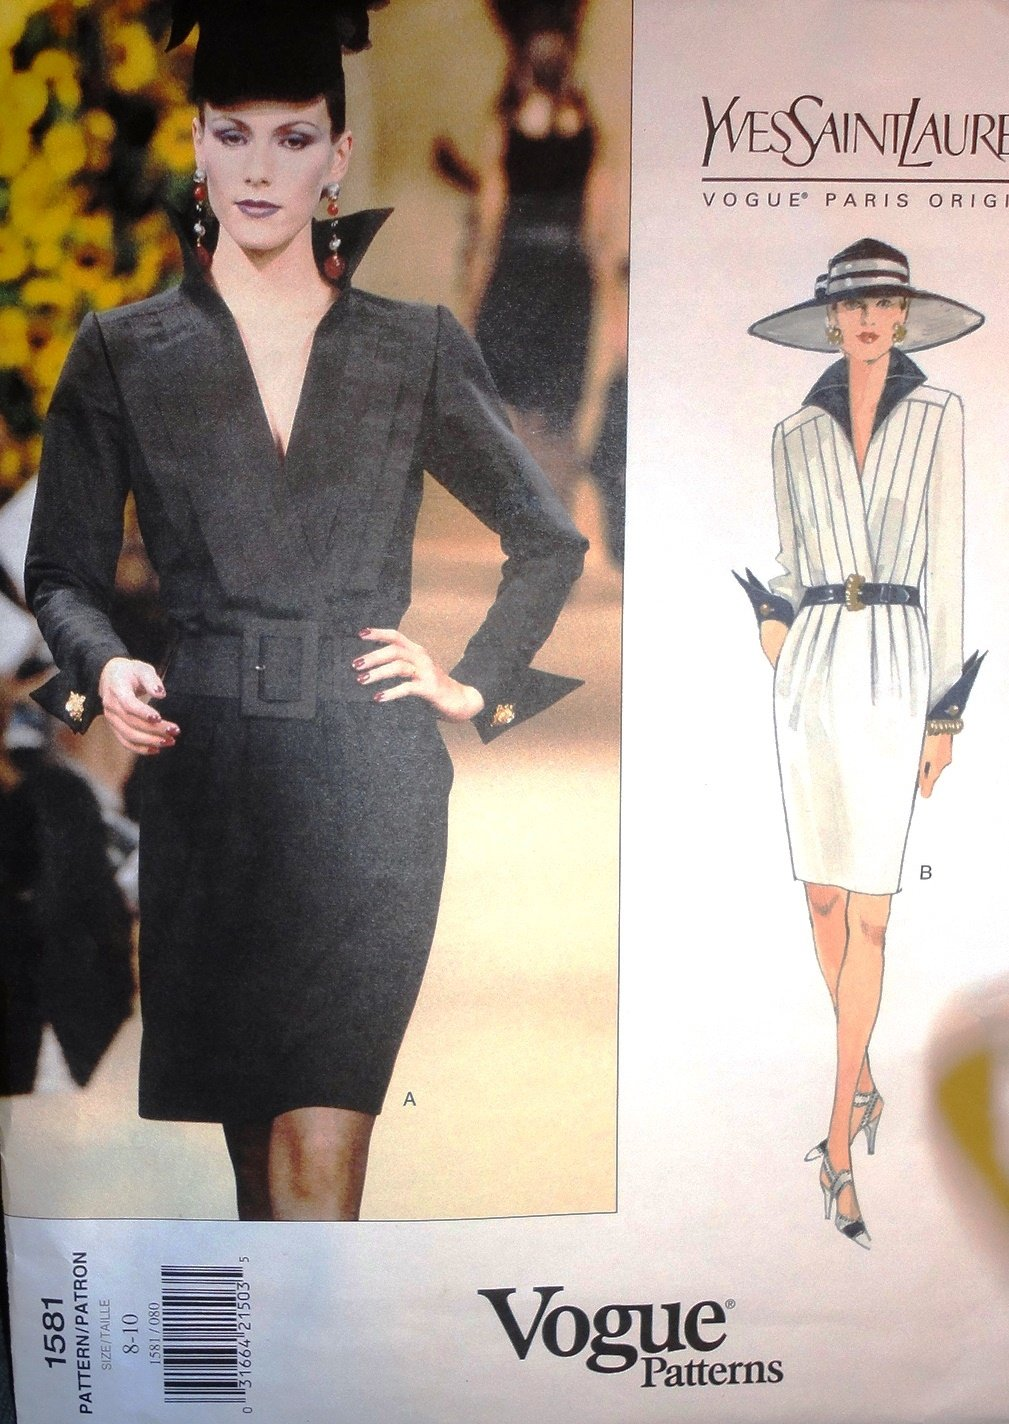 Vogue Sewing Pattern 1581 Yves Saint Laurent Dress size 8-10